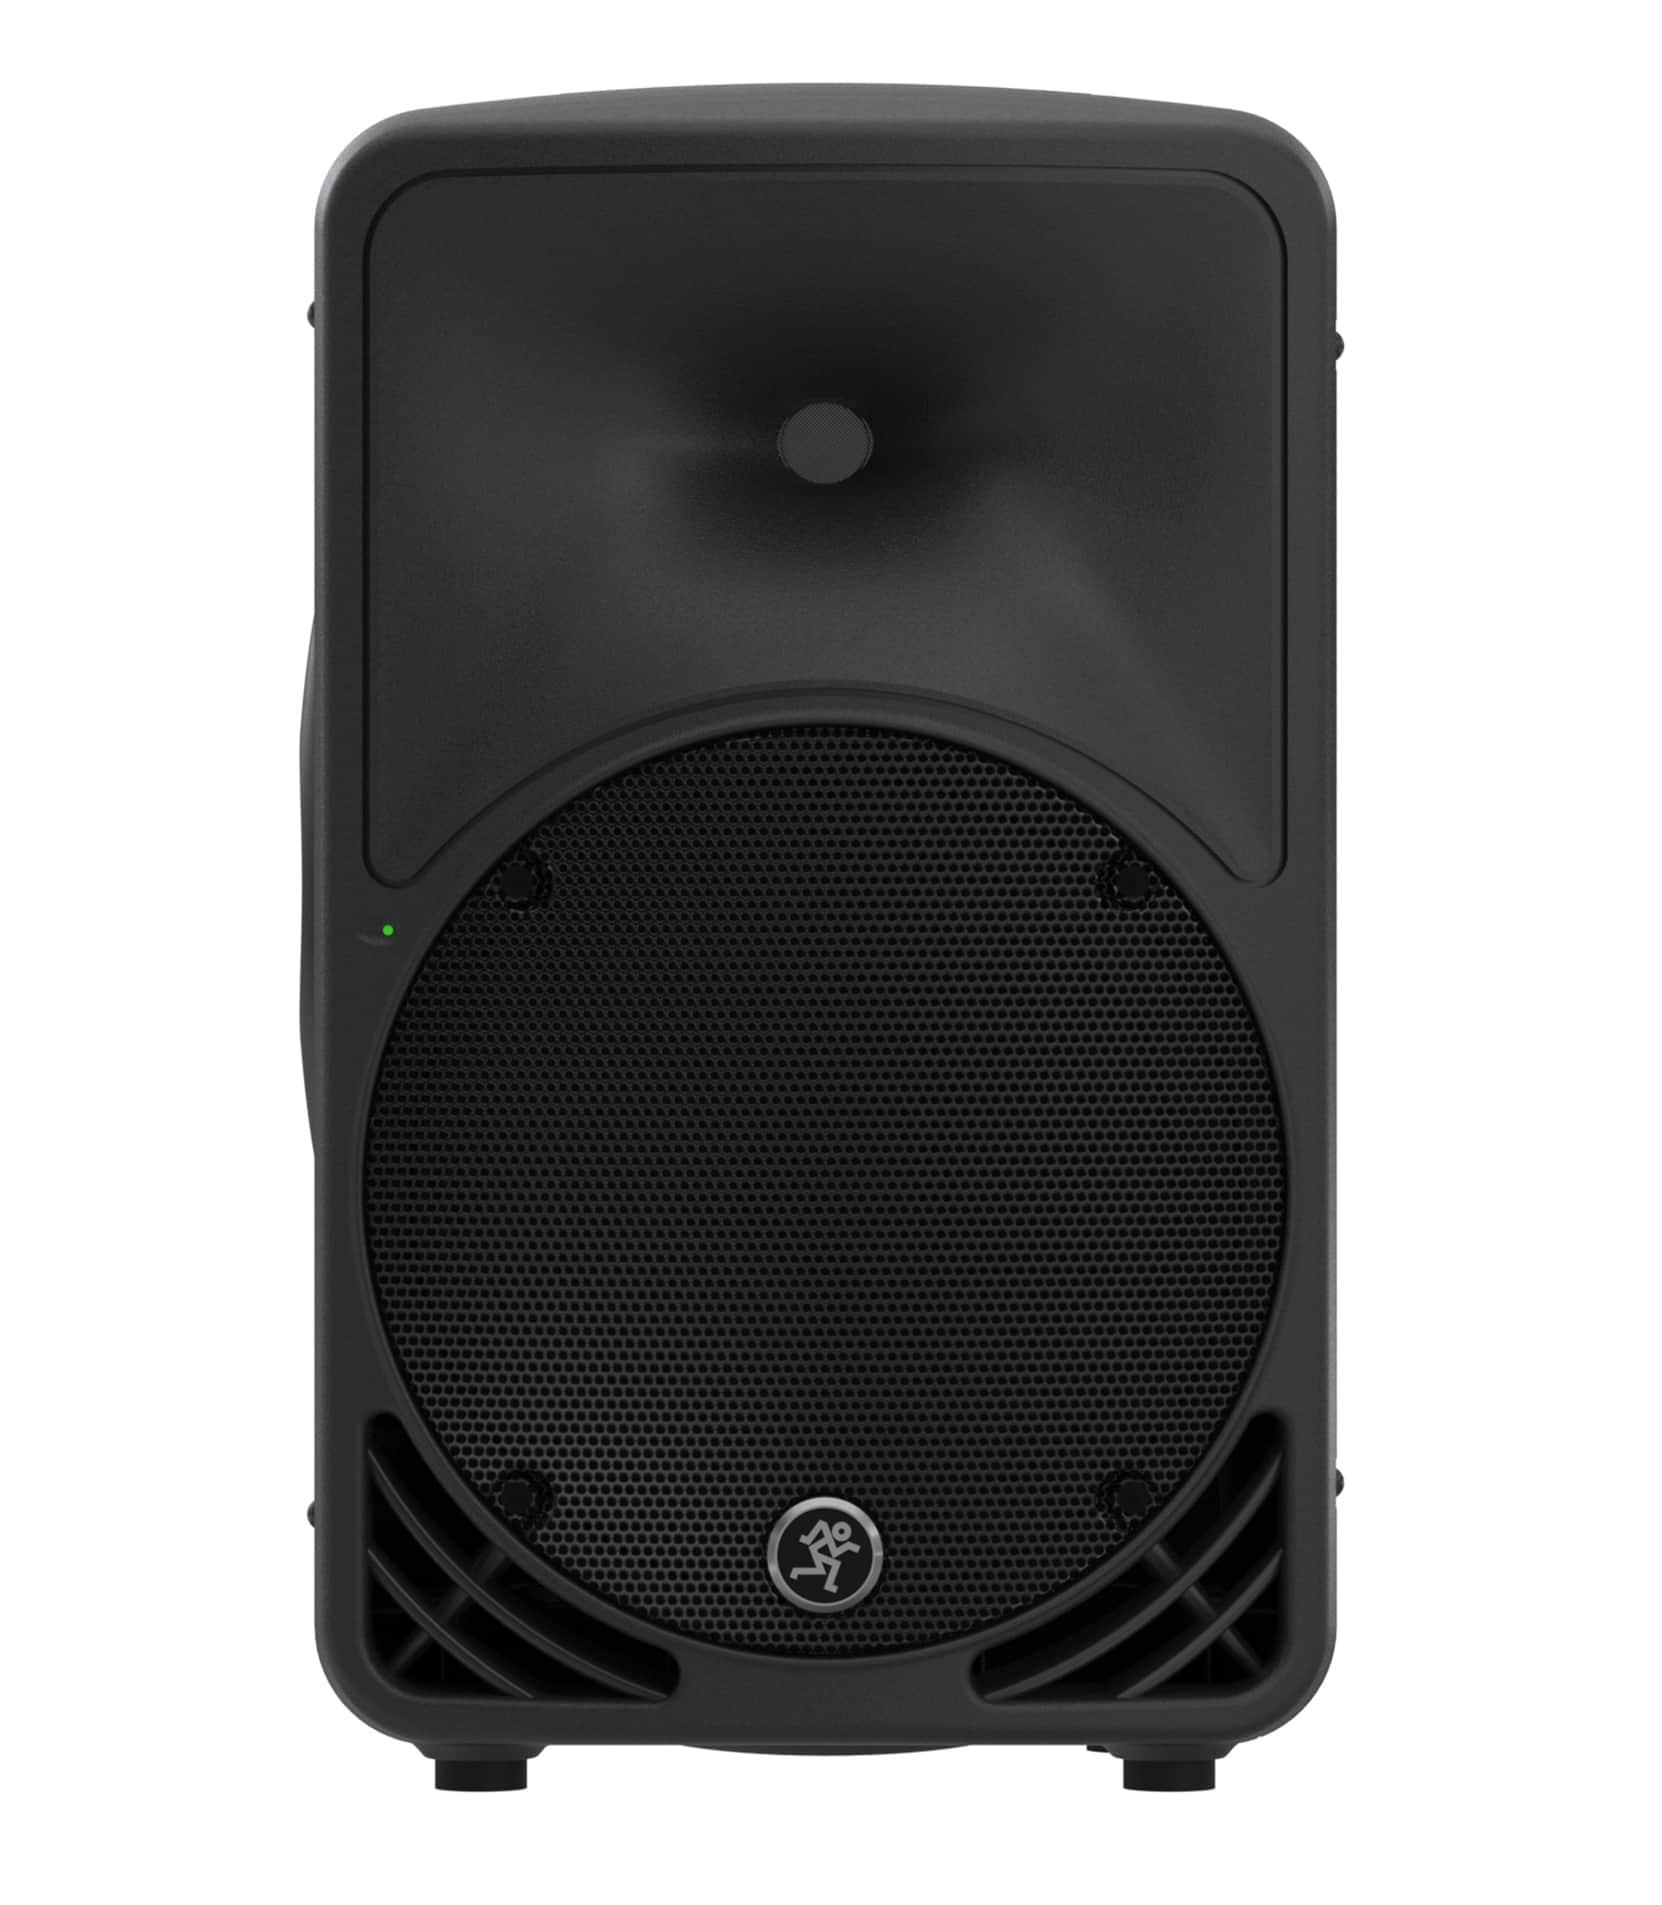 Buy Mackie - SRM350v3